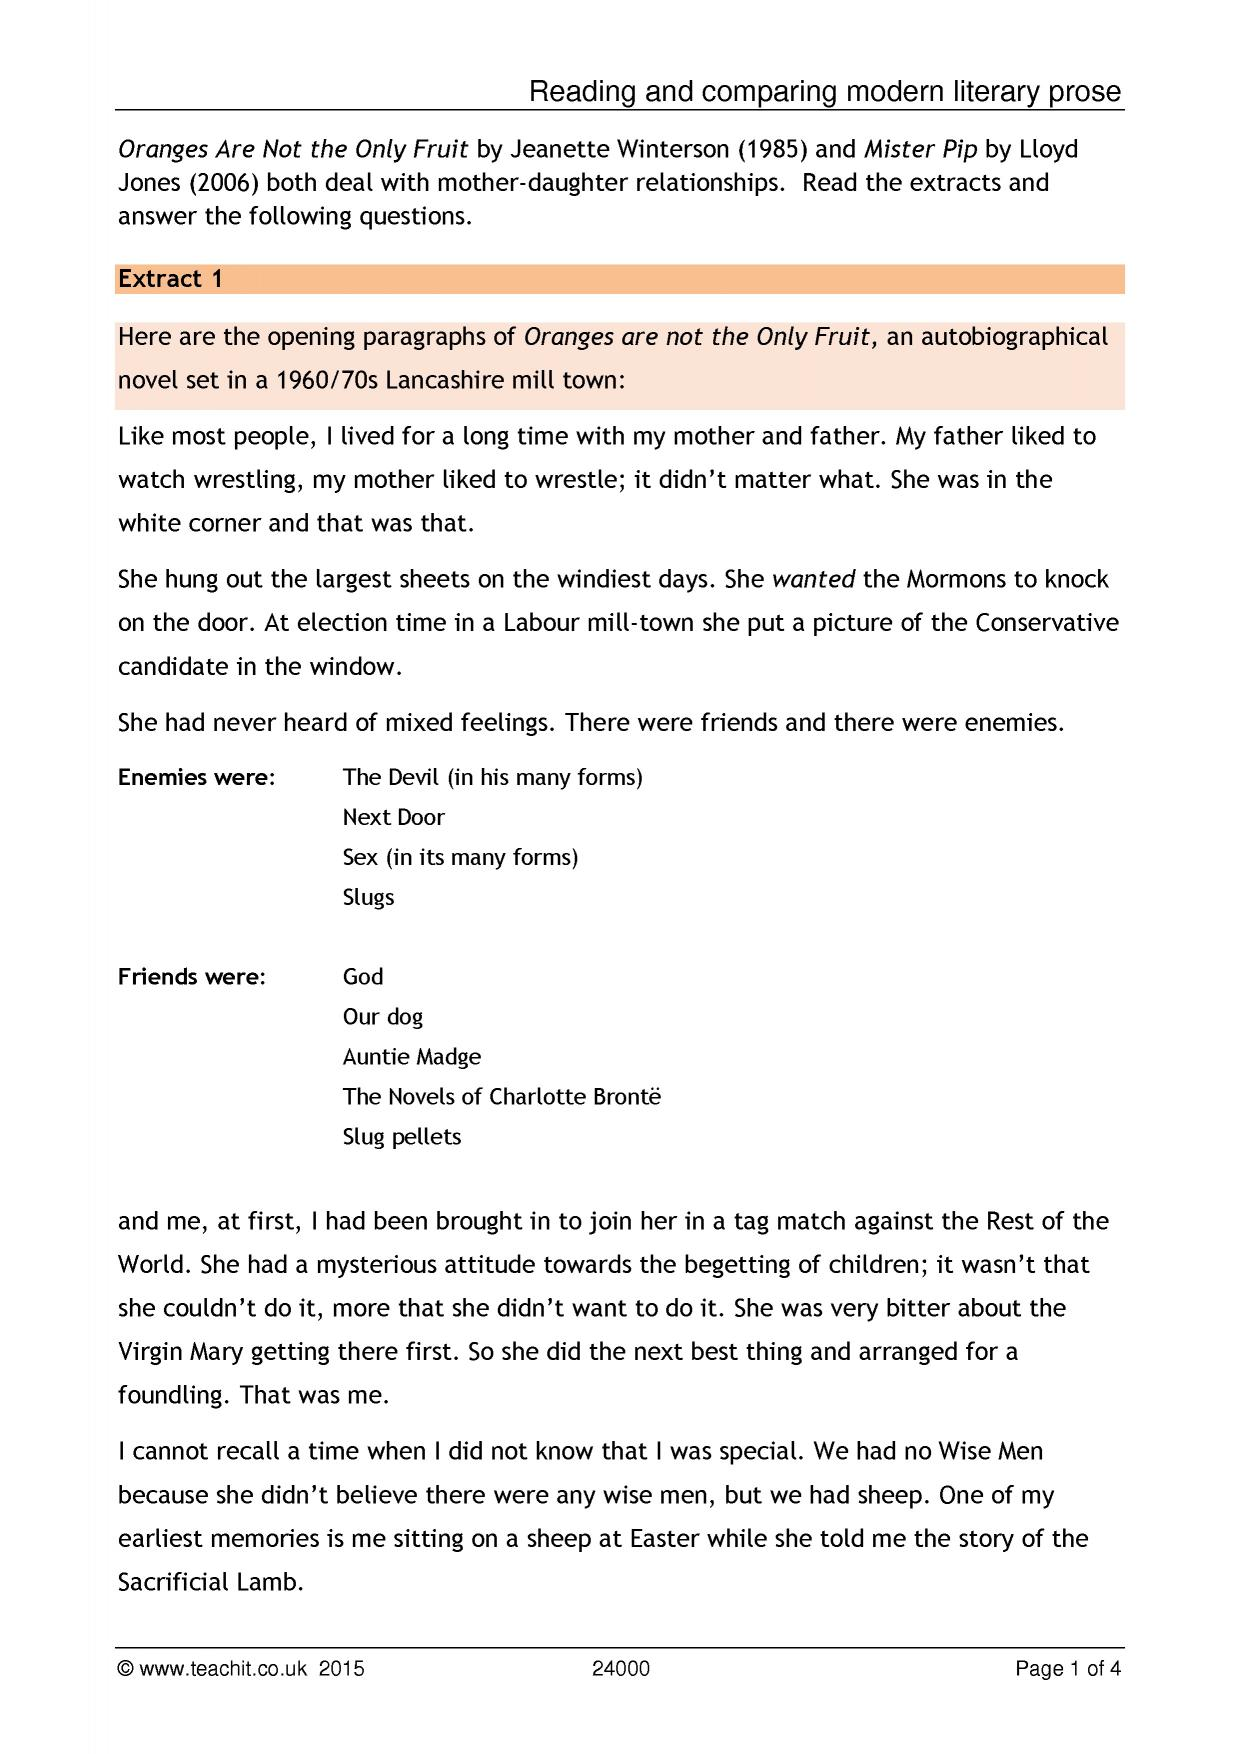 Euphemism Worksheets For High School Image Mag Euphemism